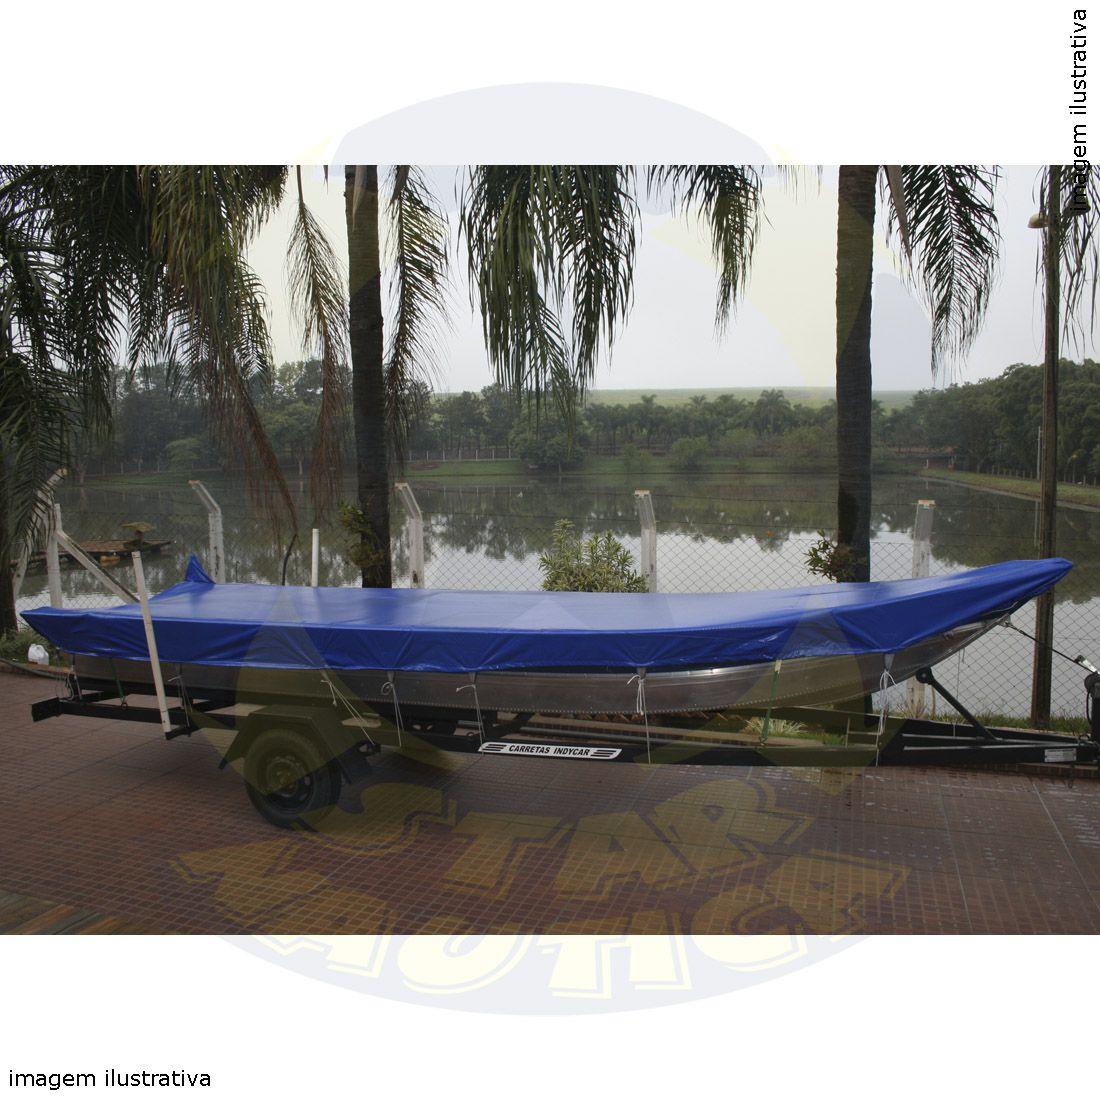 Capa Lona de Cobertura Barco Squalus 500 Lona Poliéster